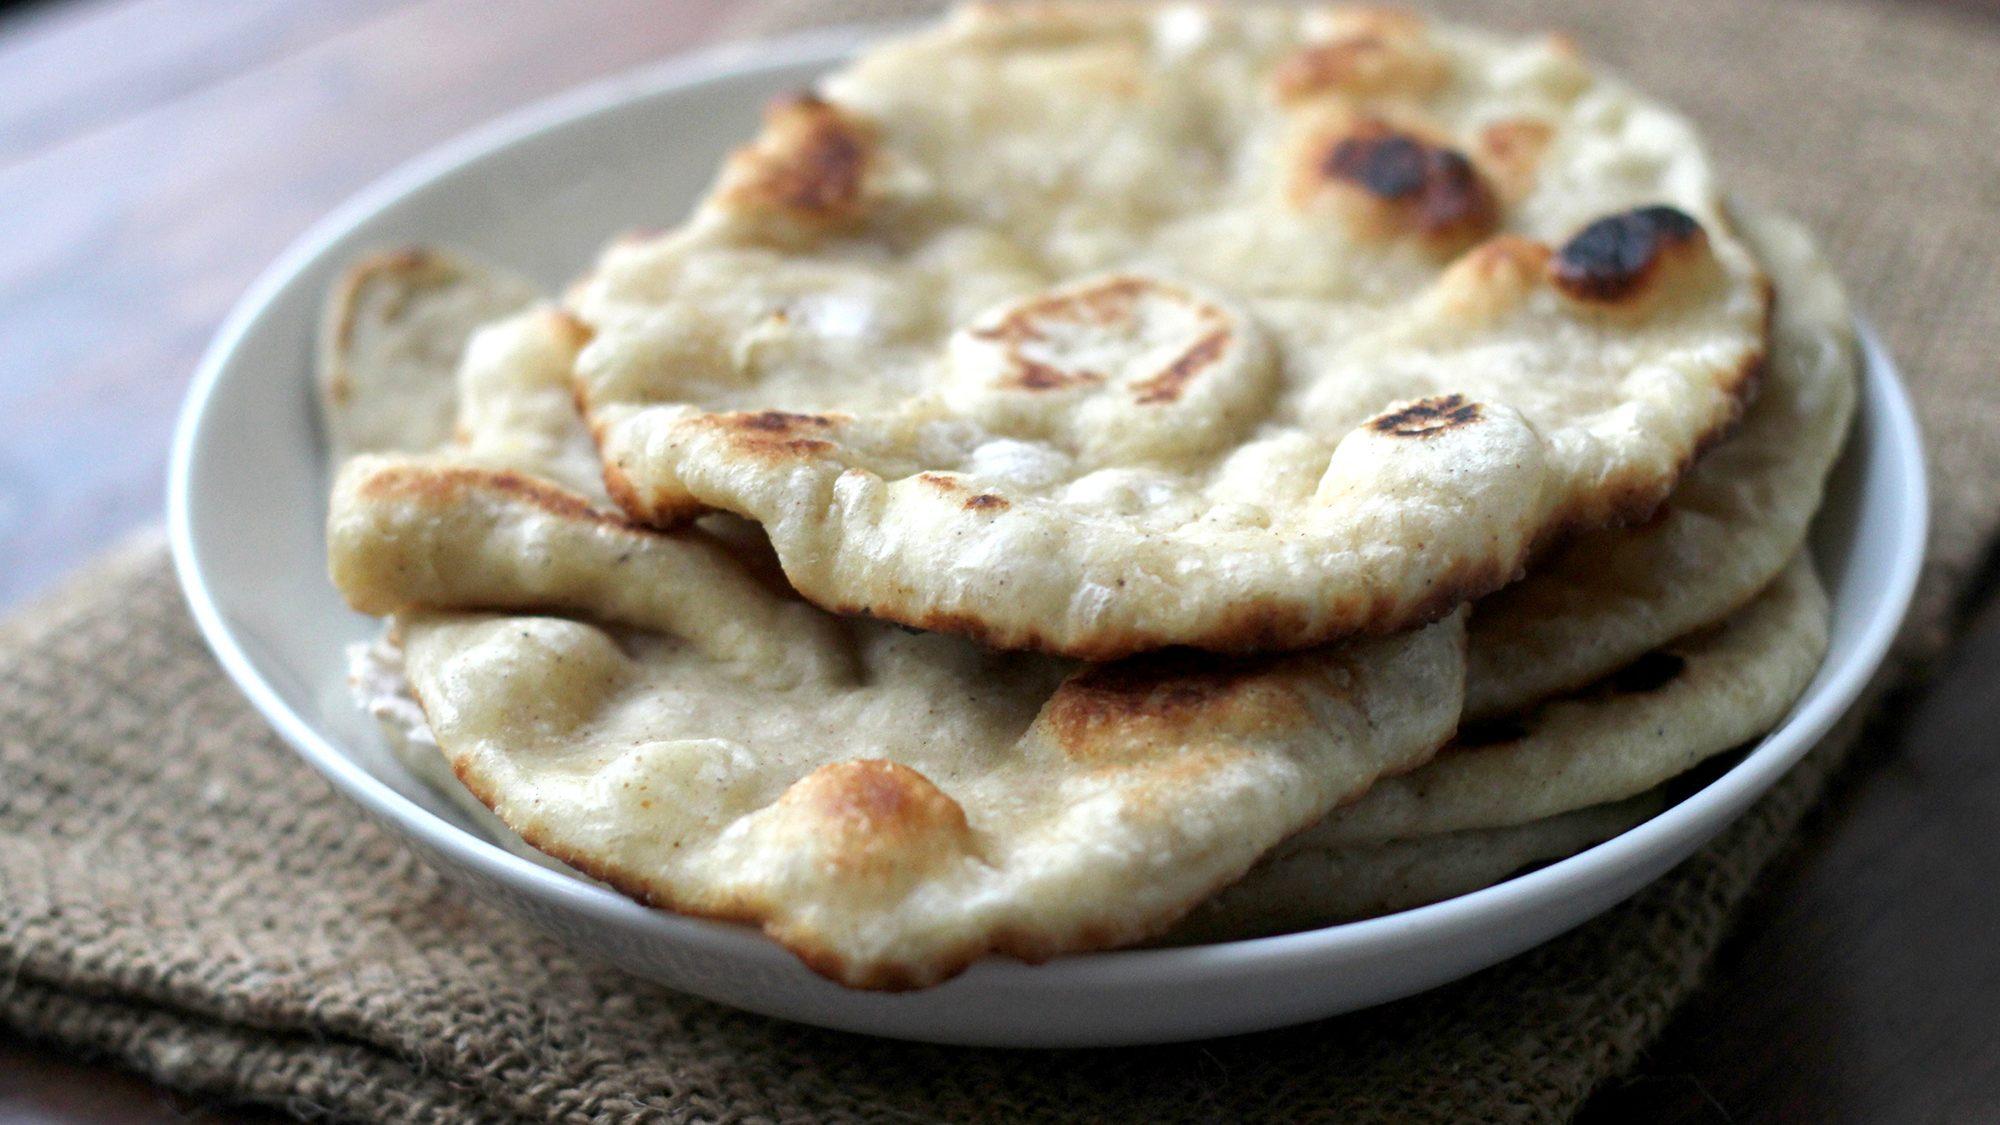 McCormick Gourmet Garam Masala-Spiced Roti Flatbread